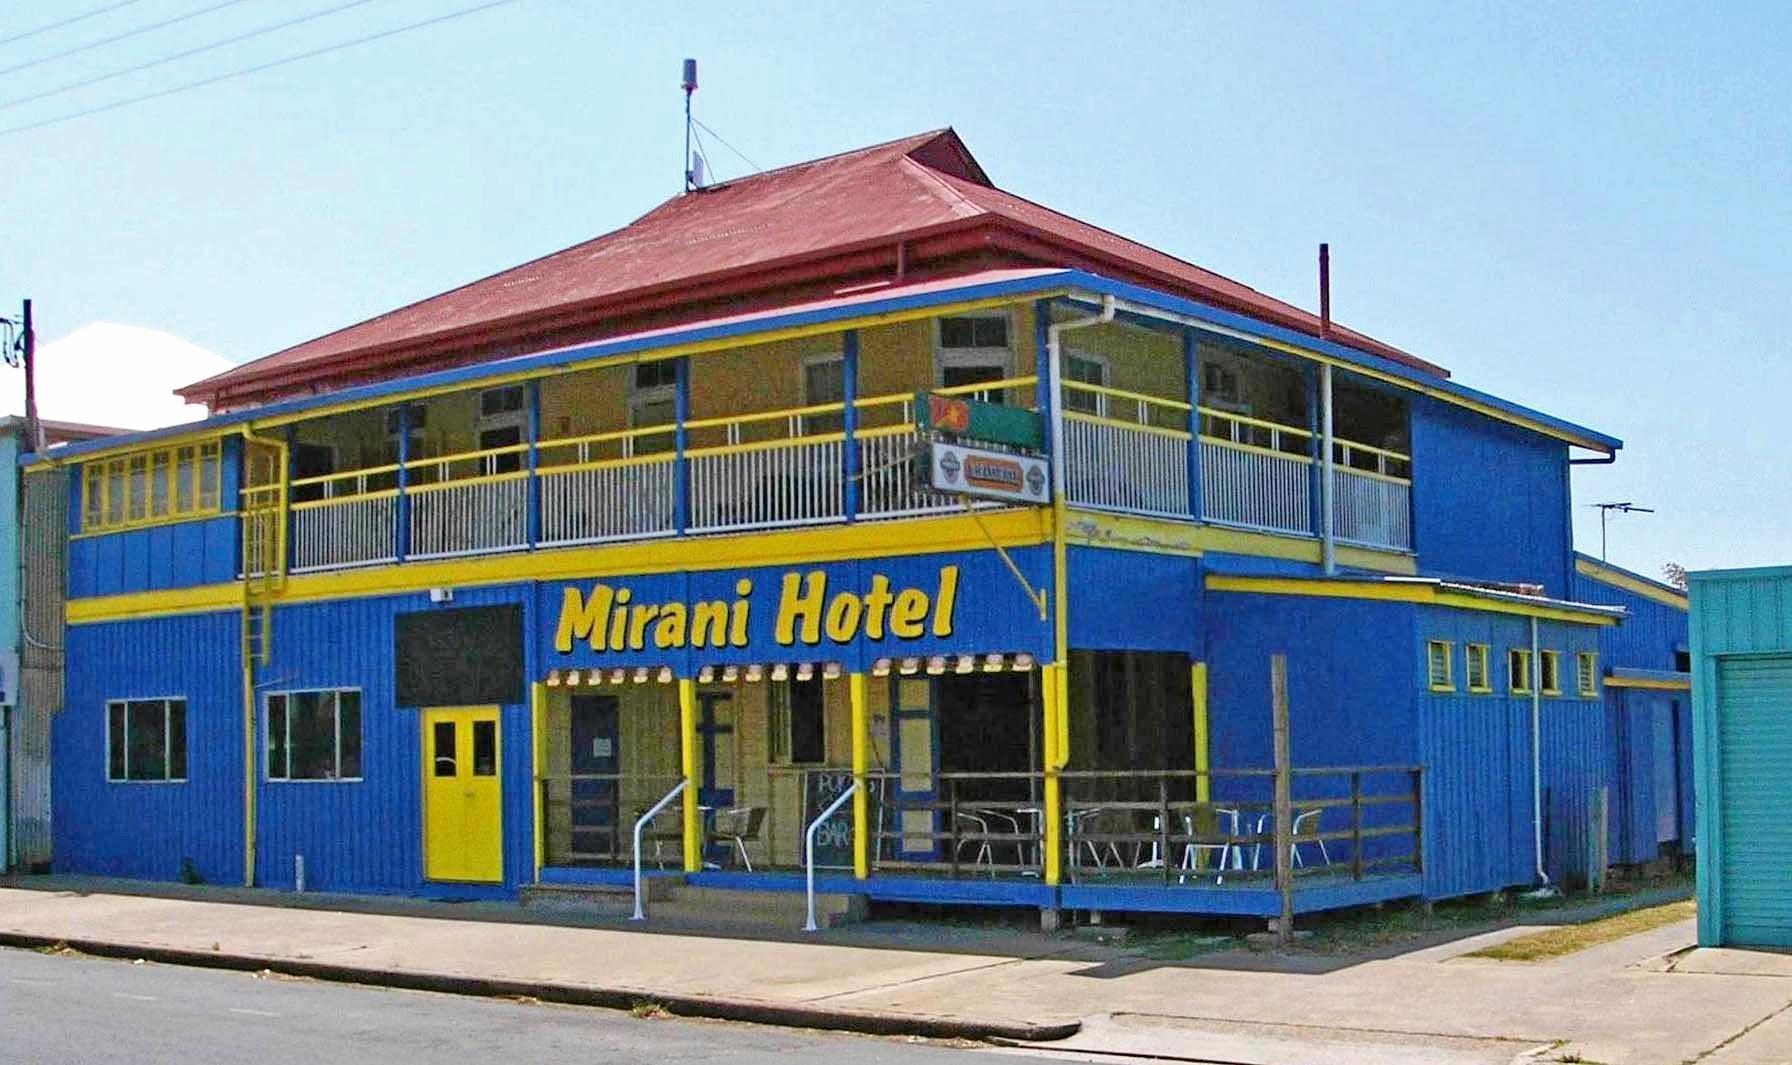 The Mirani Hotel.